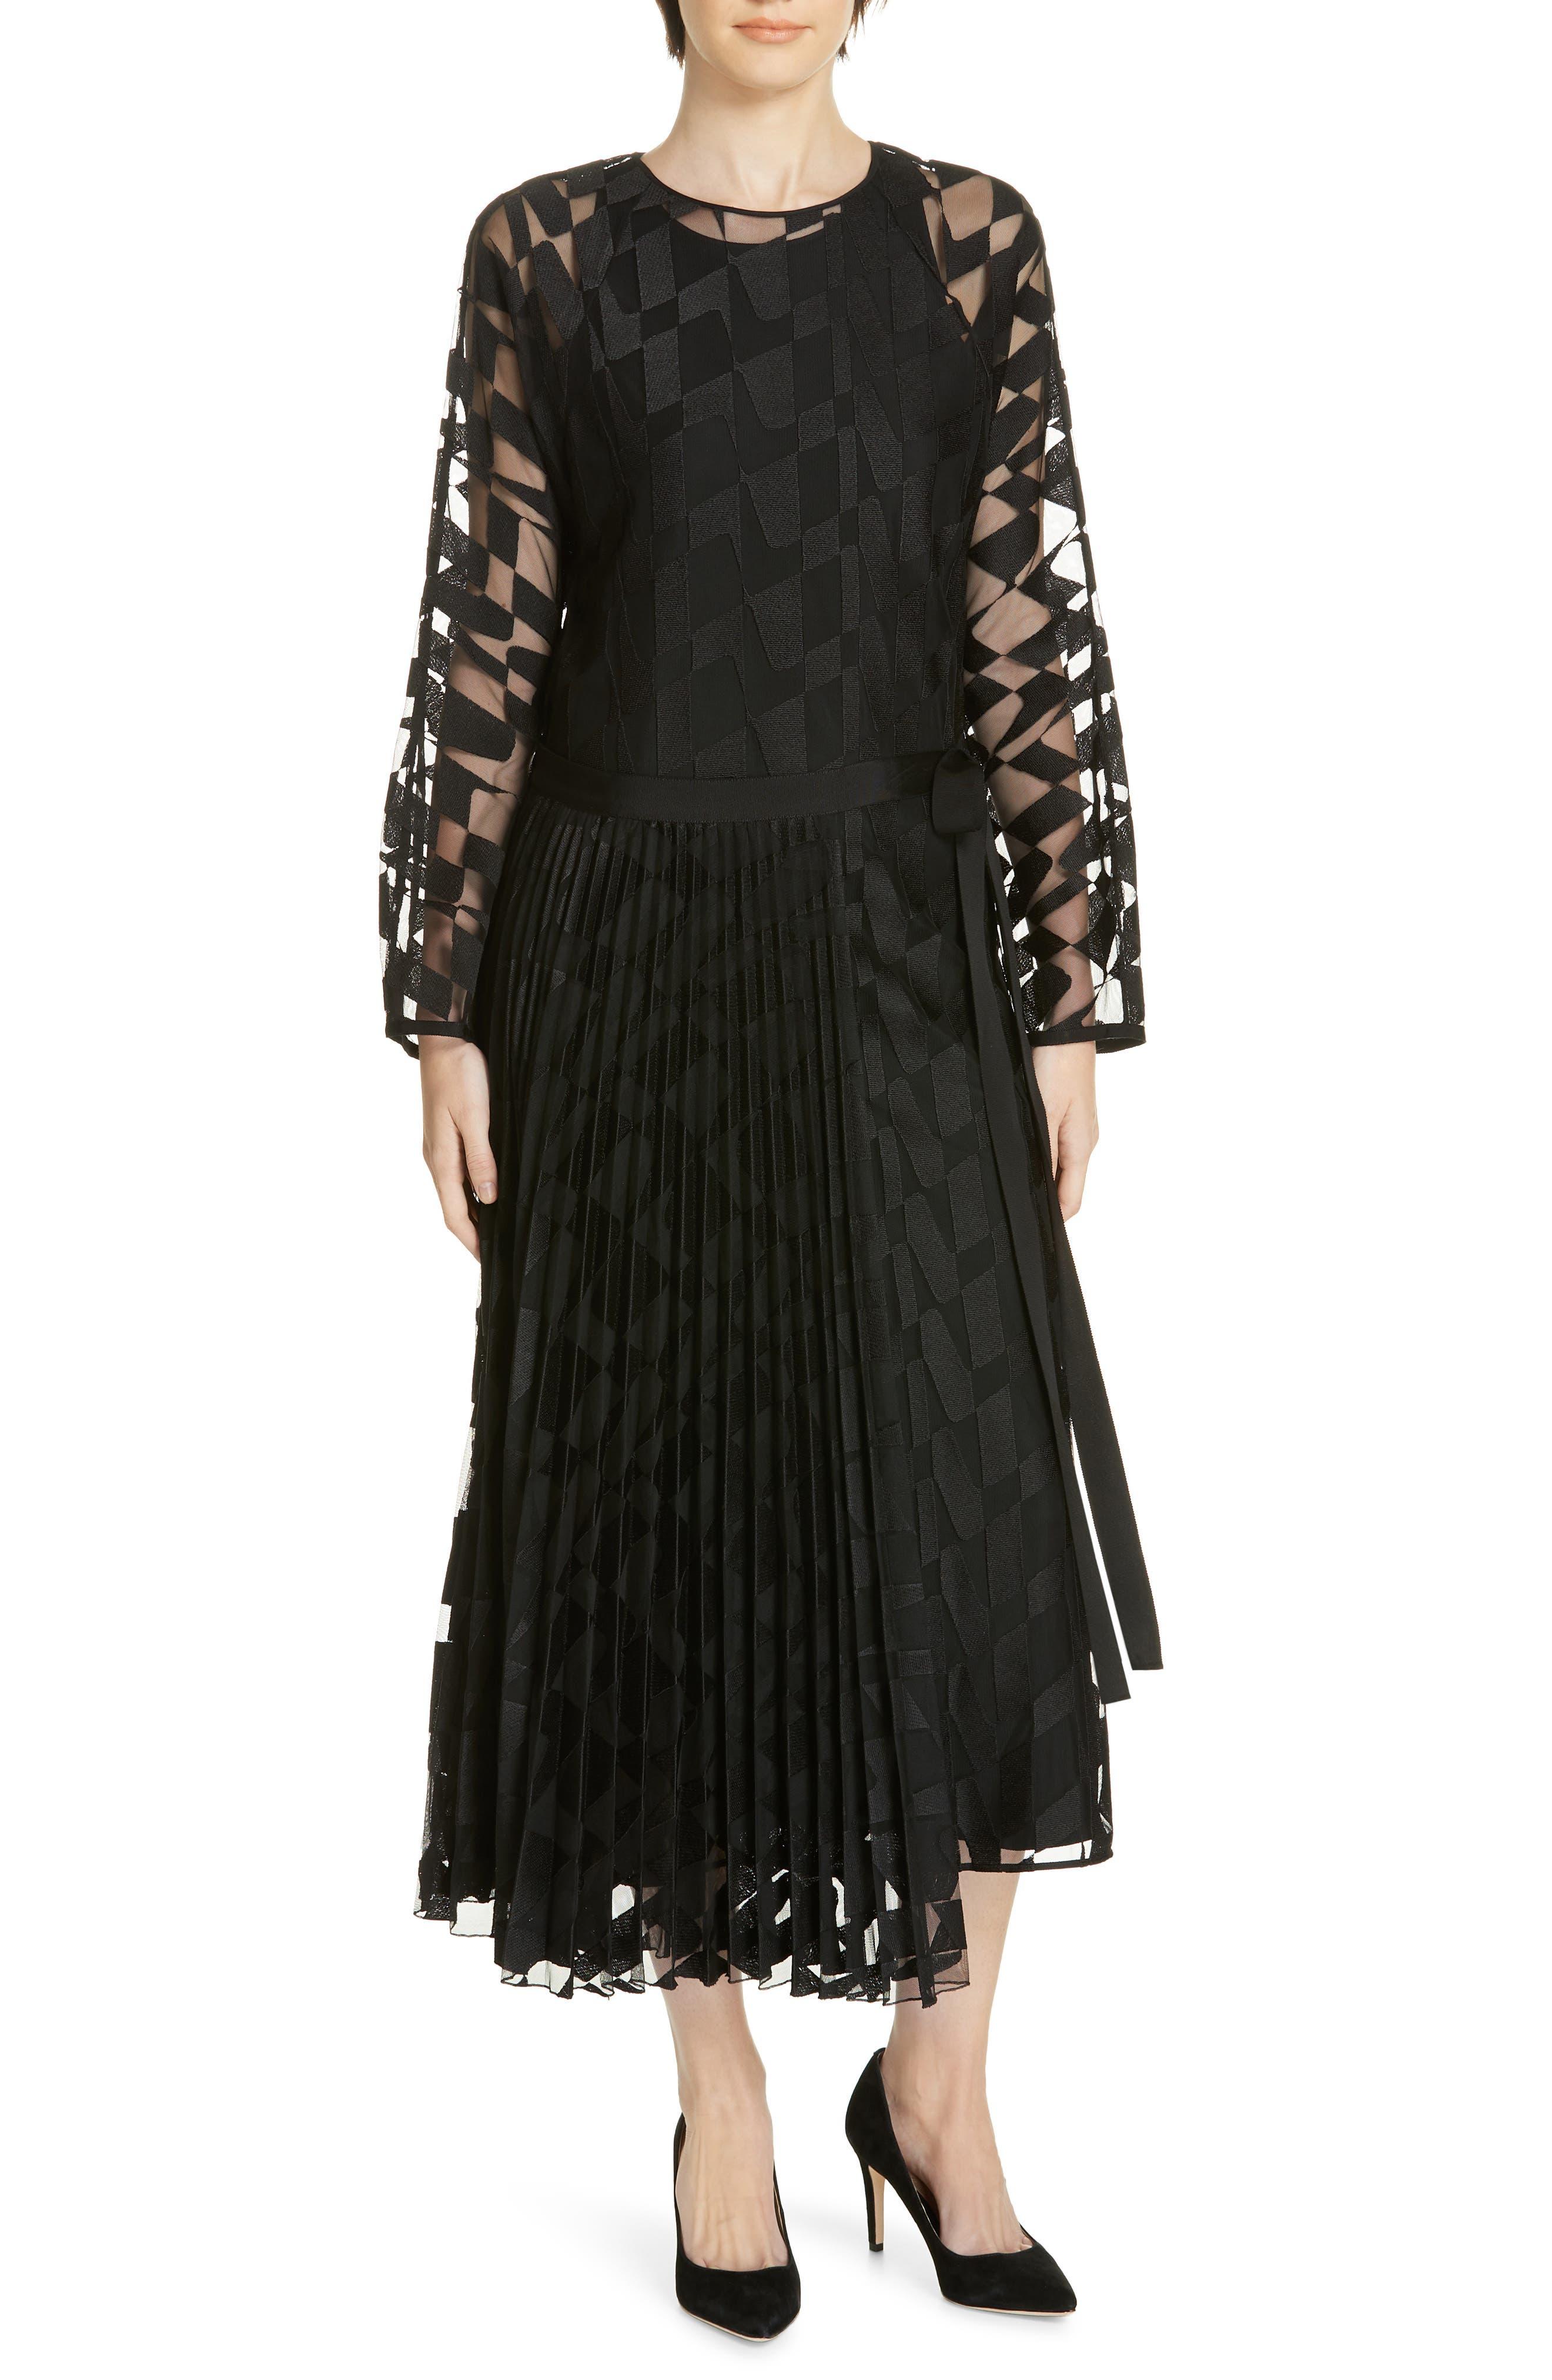 Dalace Pleat & Geo Print Midi Dress,                             Main thumbnail 1, color,                             BLACK